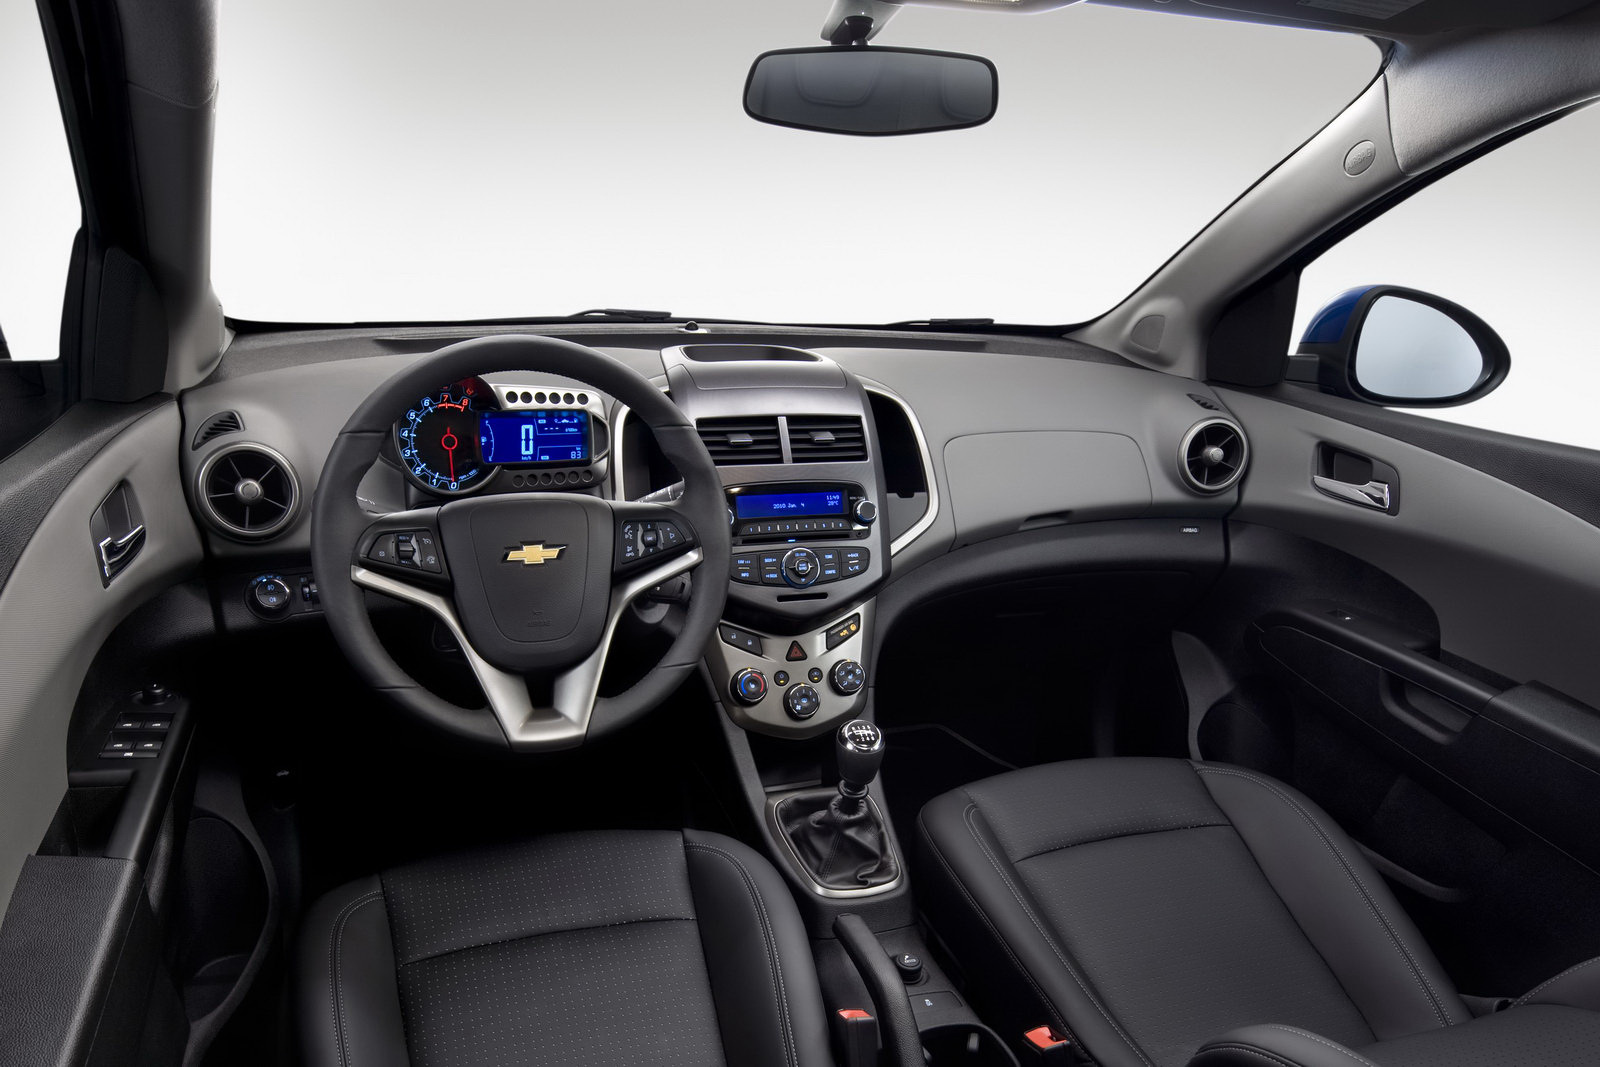 Nuova Chevrolet Aveo 6 14